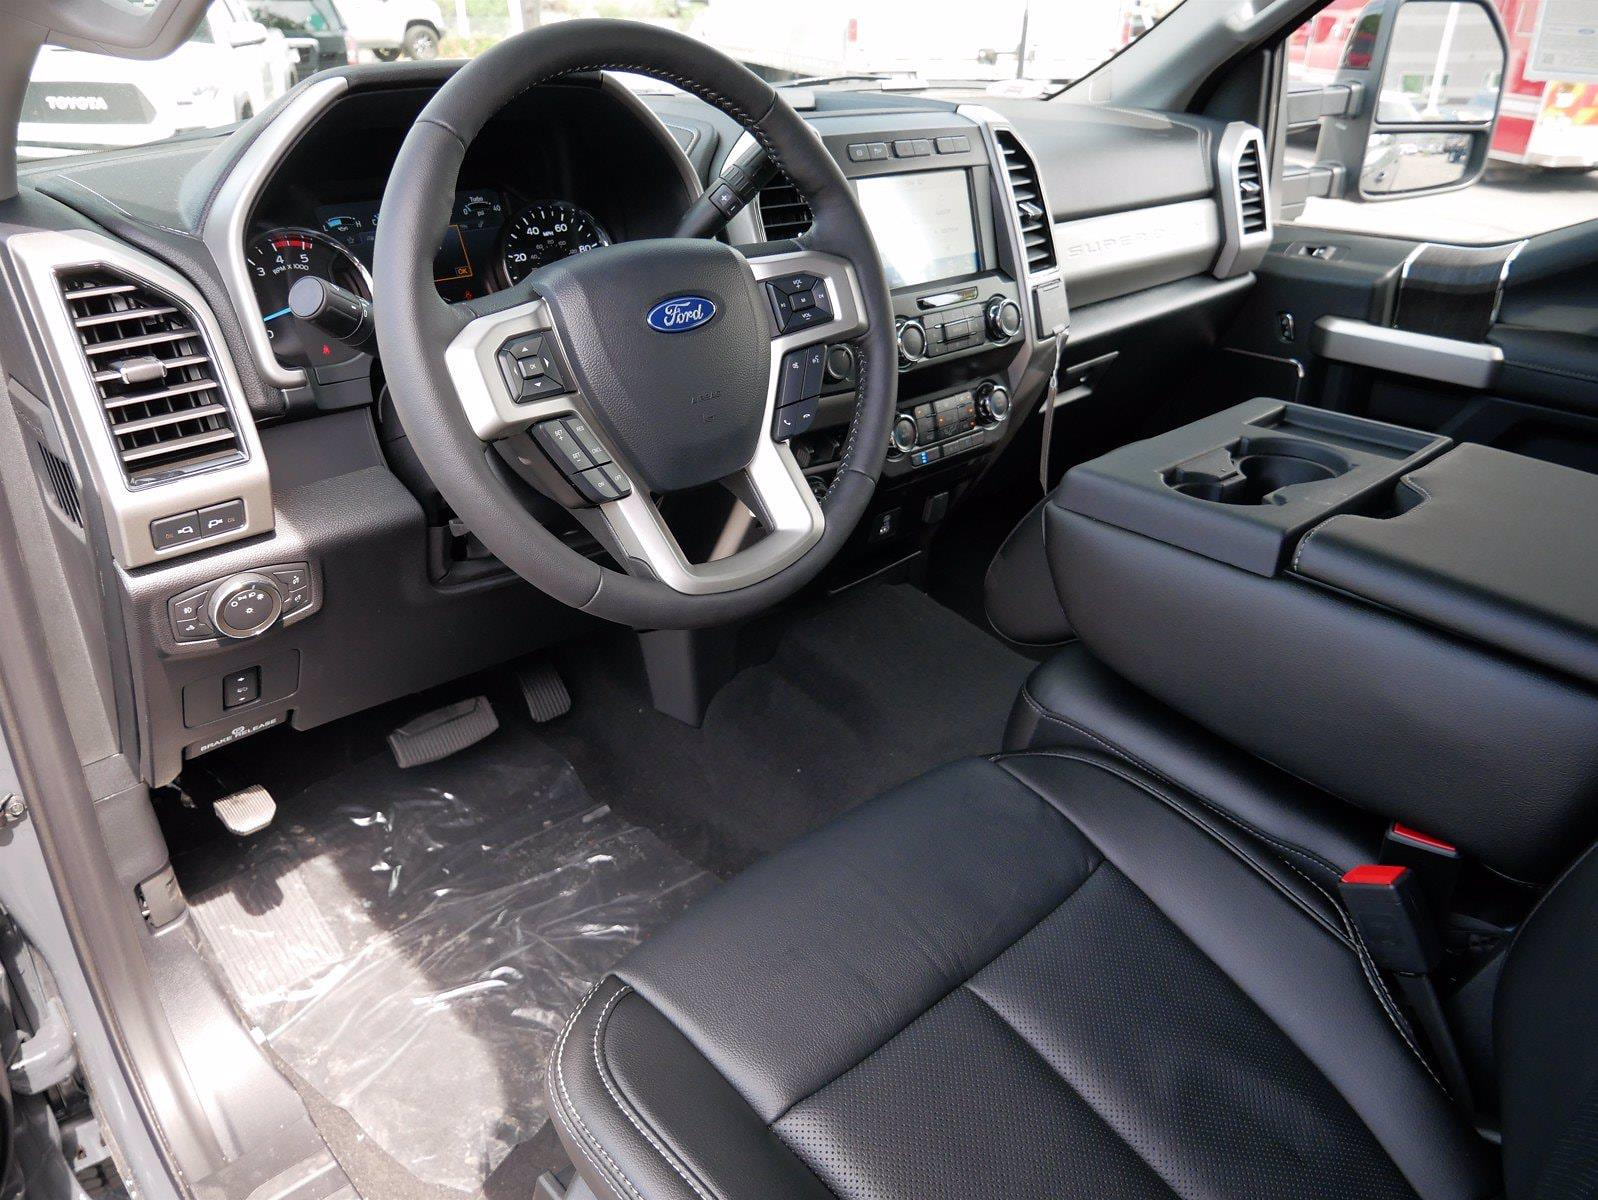 2021 Ford F-350 Crew Cab 4x4, Pickup #24540 - photo 14